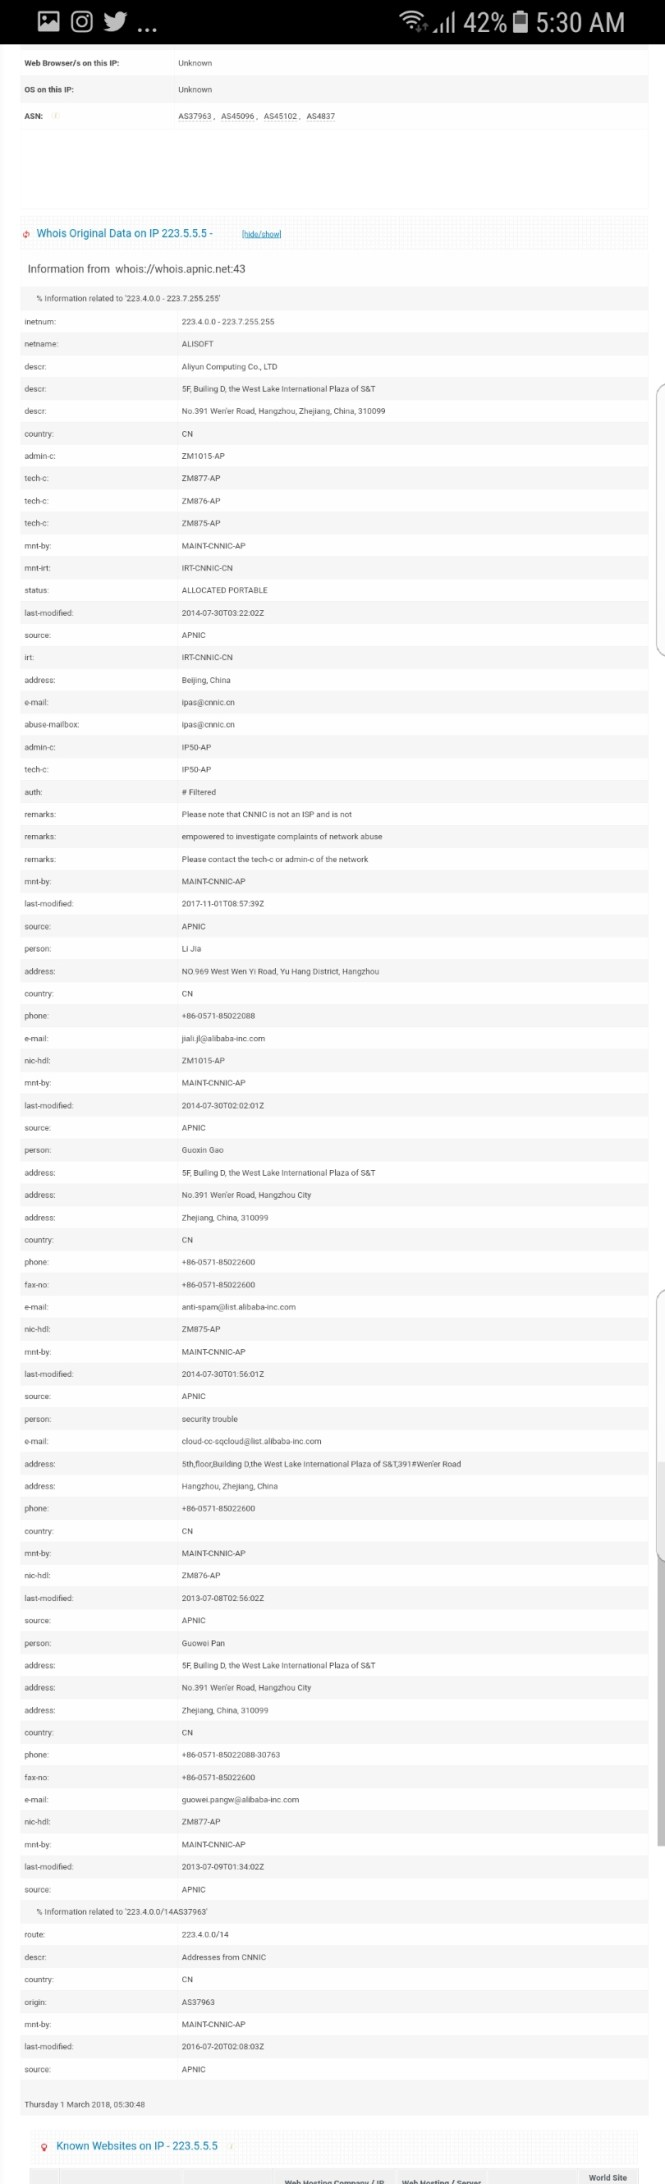 Hasil Whois di myip.ms/info/whois/223.5.5.5